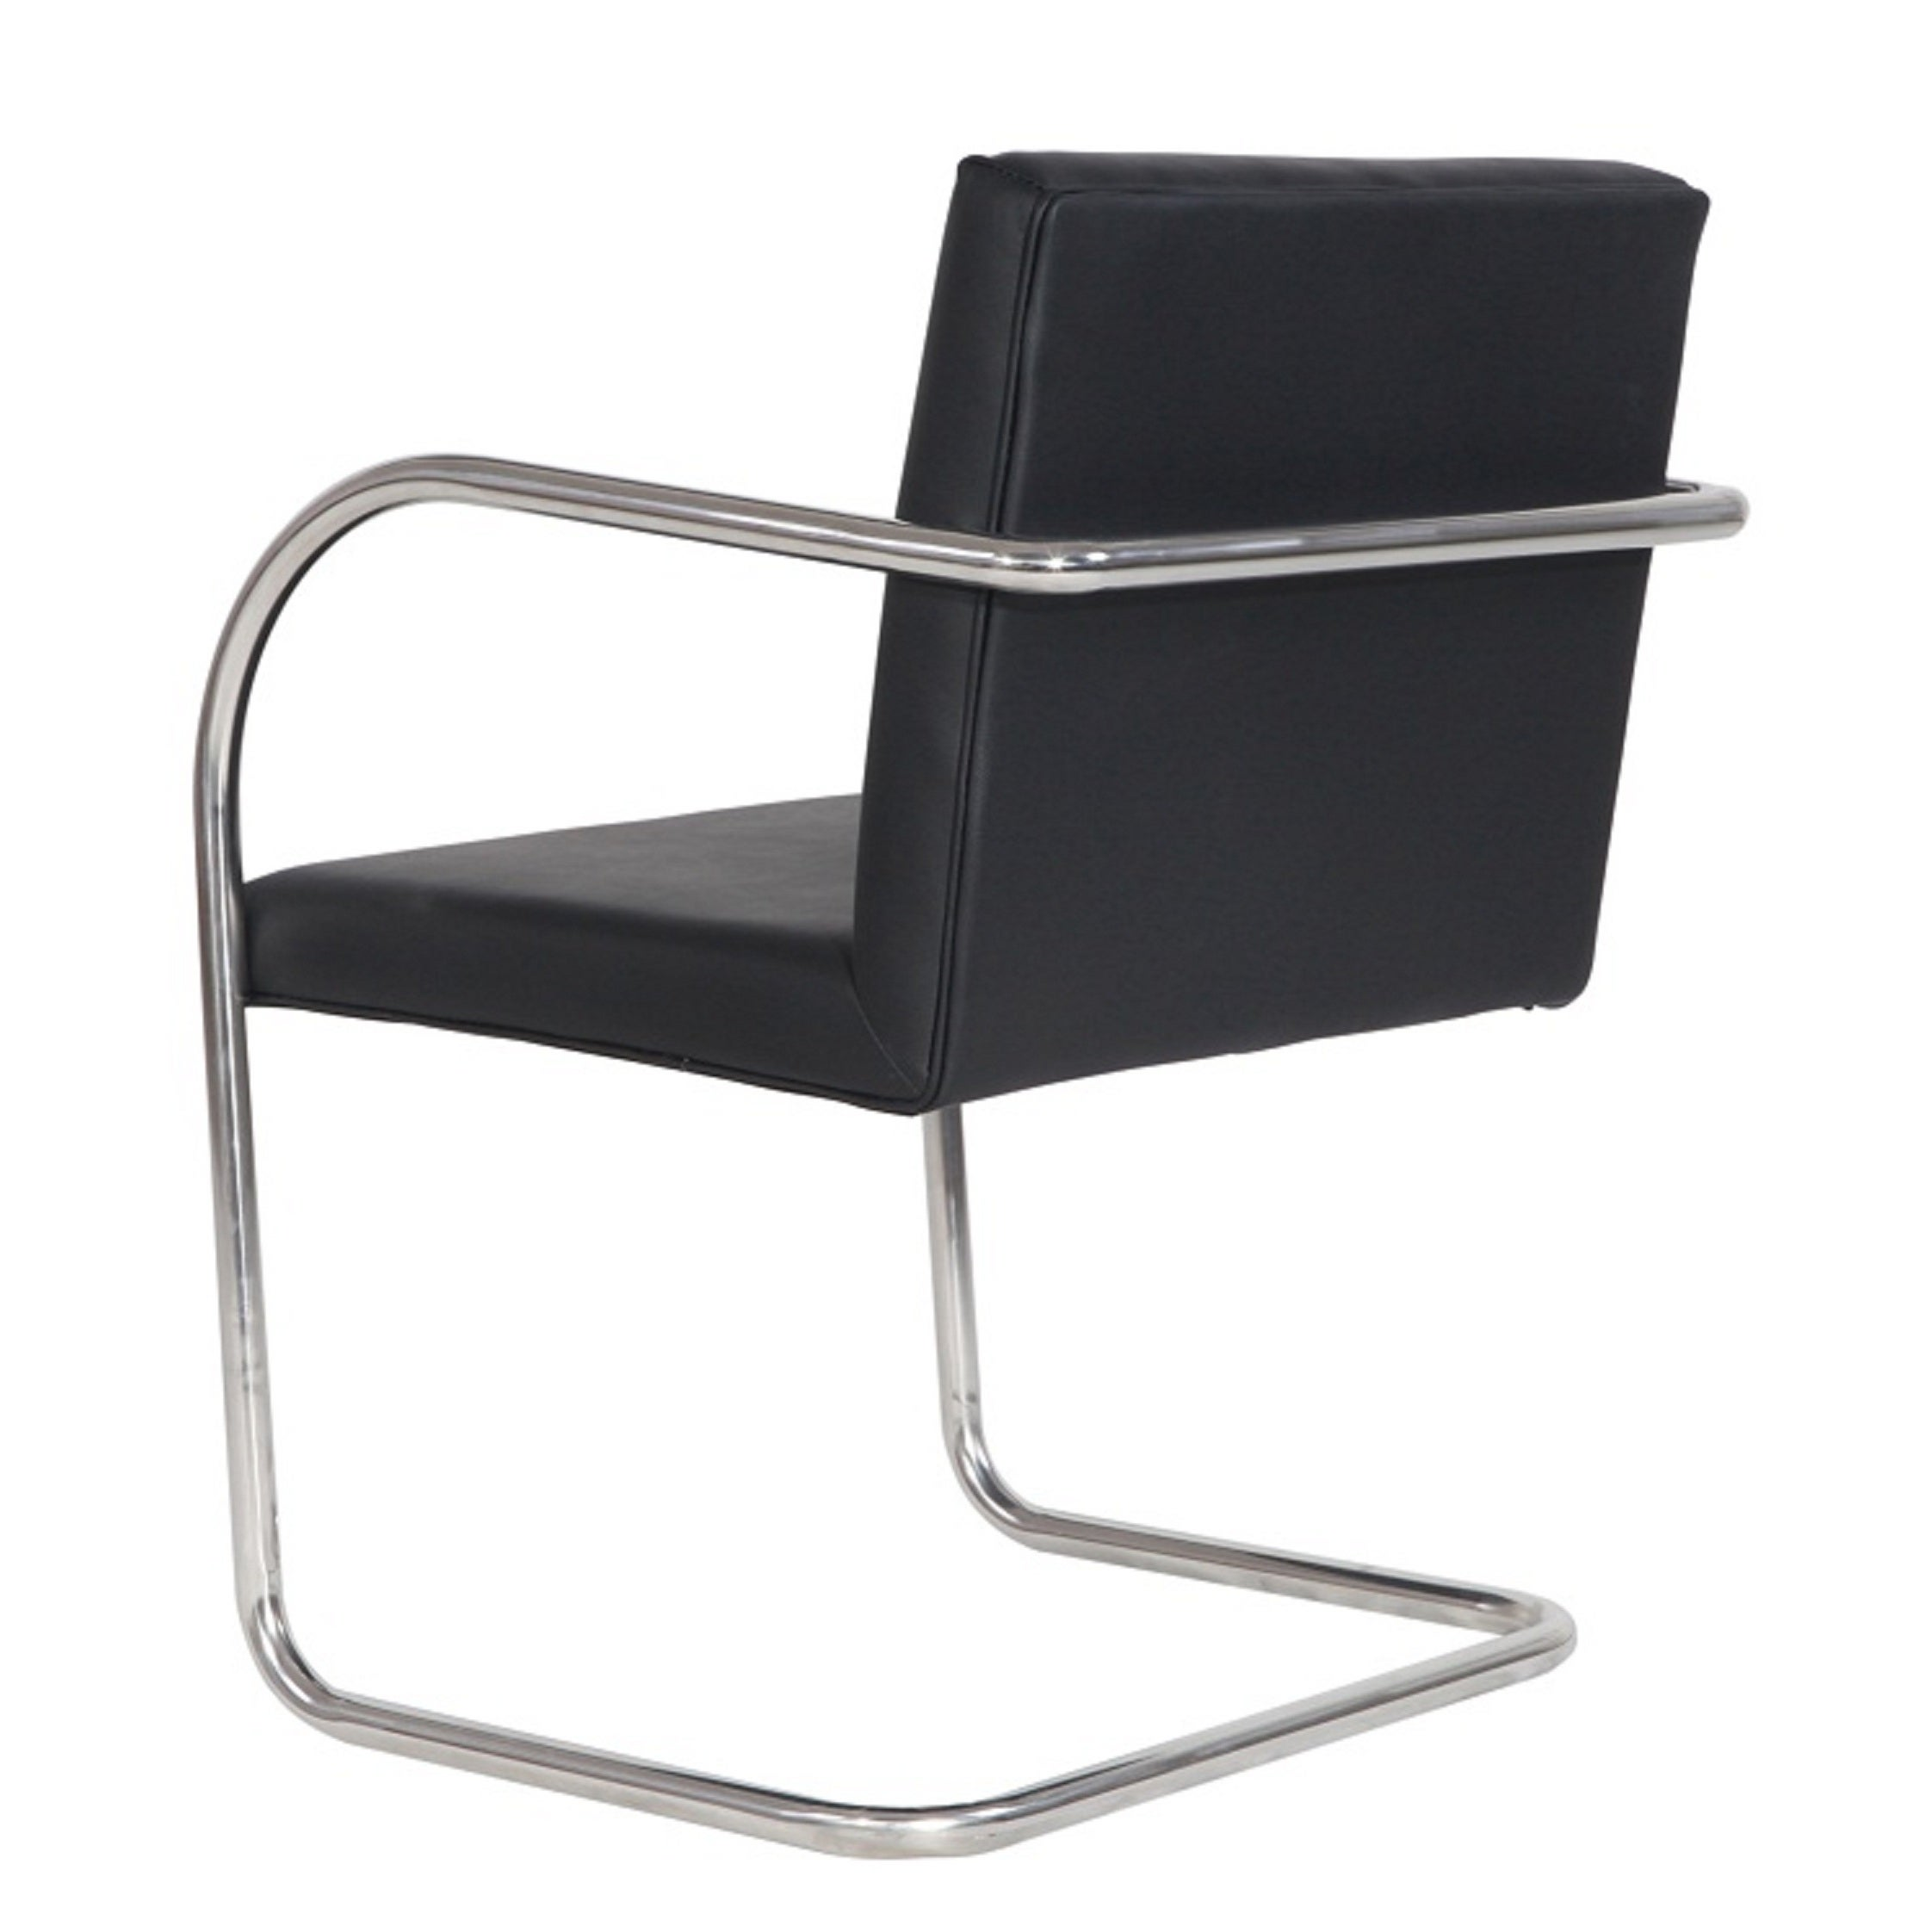 Charmant Shop MLF Brno Tubular Chair   Free Shipping Today   Overstock.com   13992208